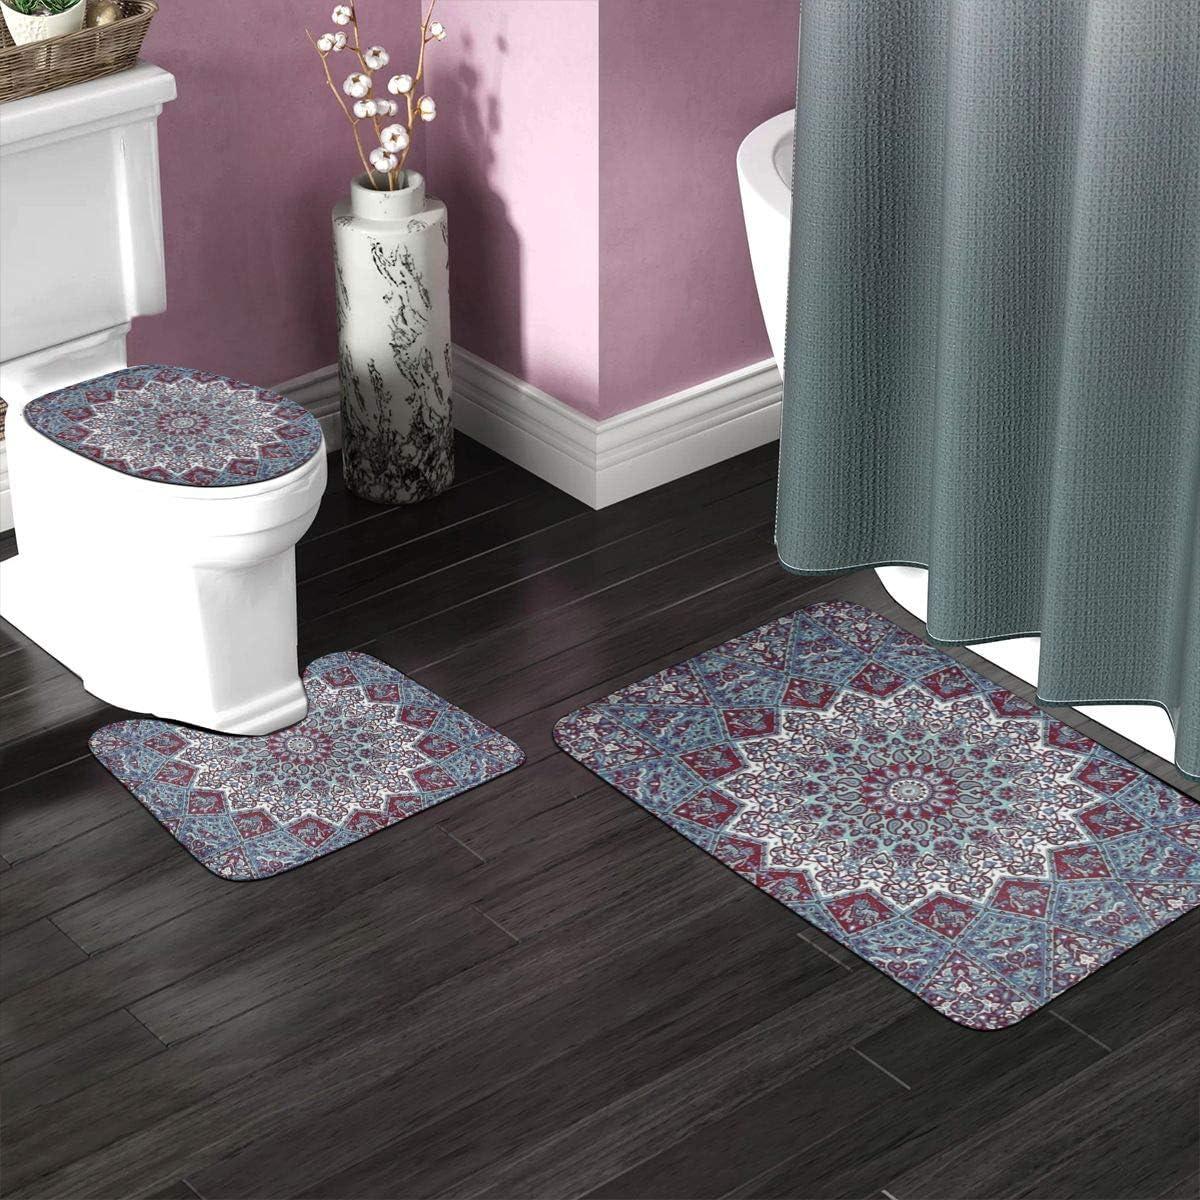 BTGVGSE Western Dragon Printed 3 Pack Non-Slip Bathroom Toilet Rug Set,Includes U-Shaped Contour Toilet Mat,Bath Mat and Toilet Lid Cover